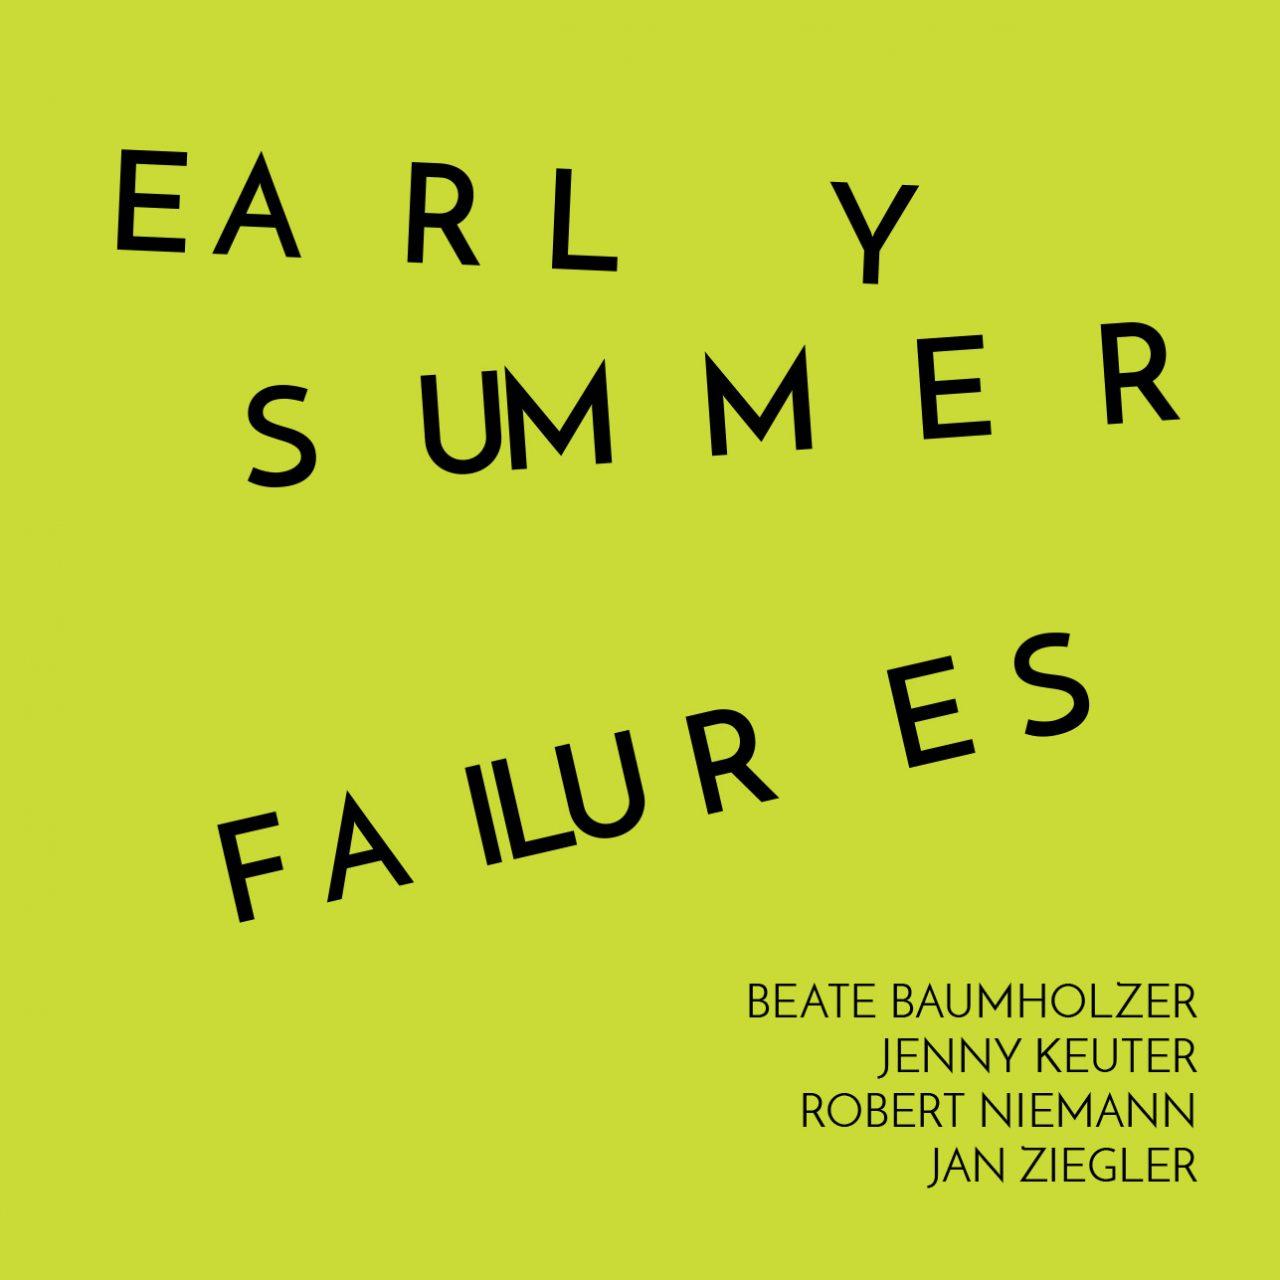 EARLY SUMMER FAILURES